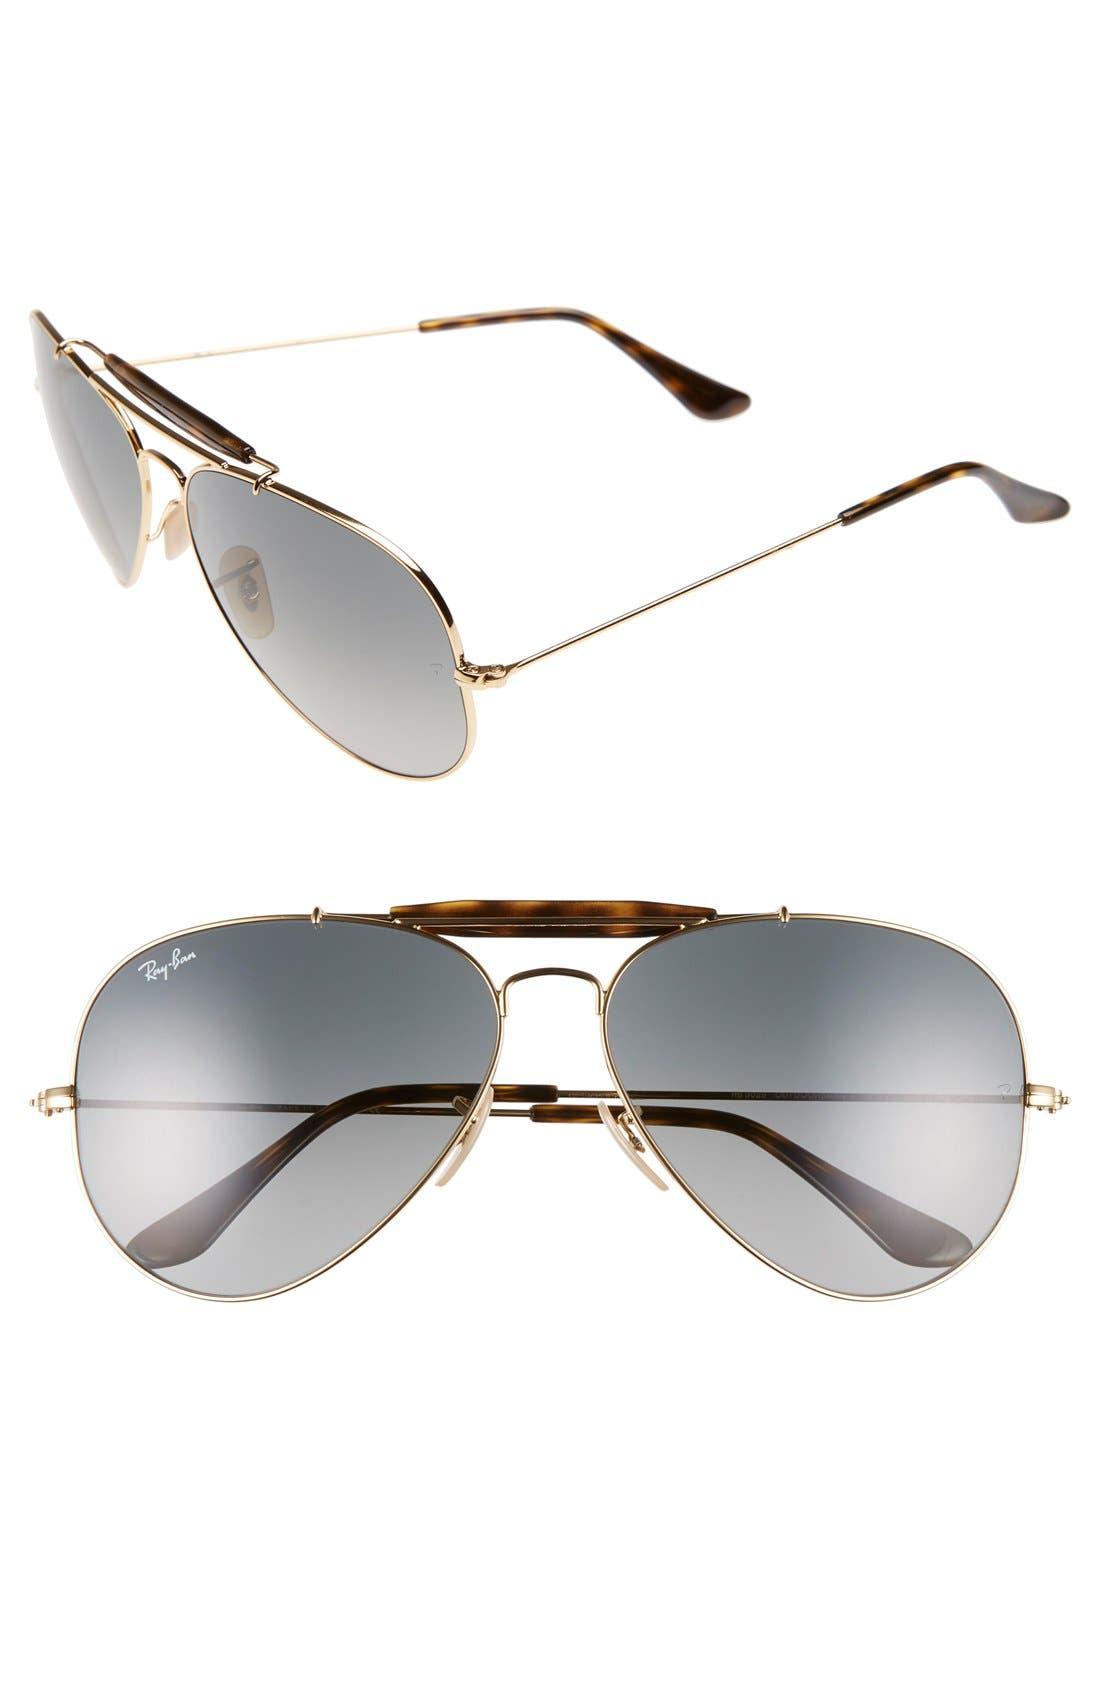 RAY-BAN Outdoorsman II 62mm Sunglasses